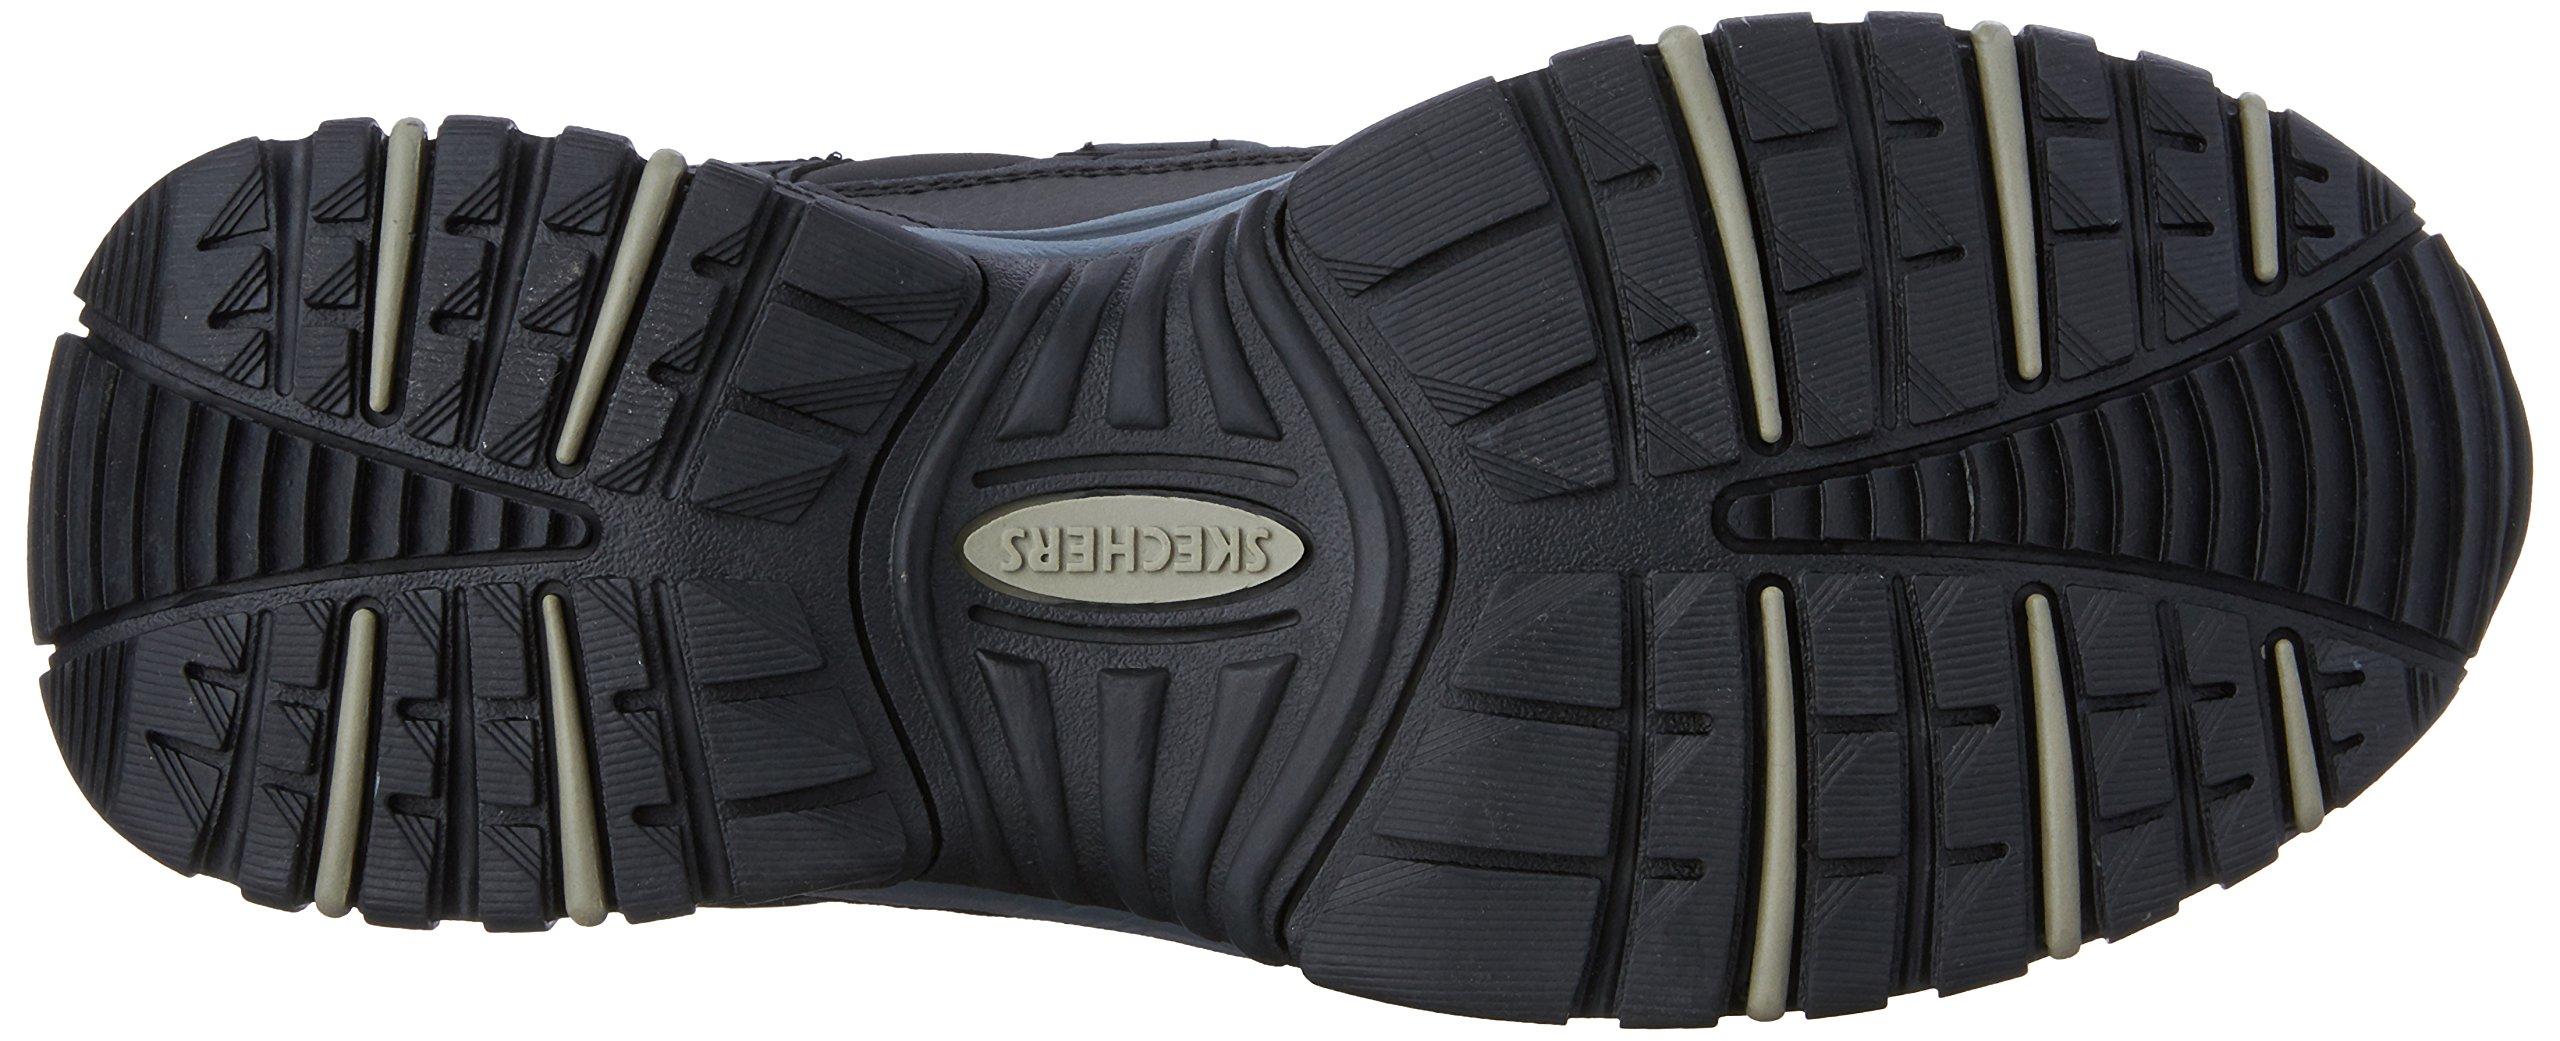 Skechers Men's Energy Afterburn Lace-Up Sneaker,Black/Gray,14 M US by Skechers (Image #3)